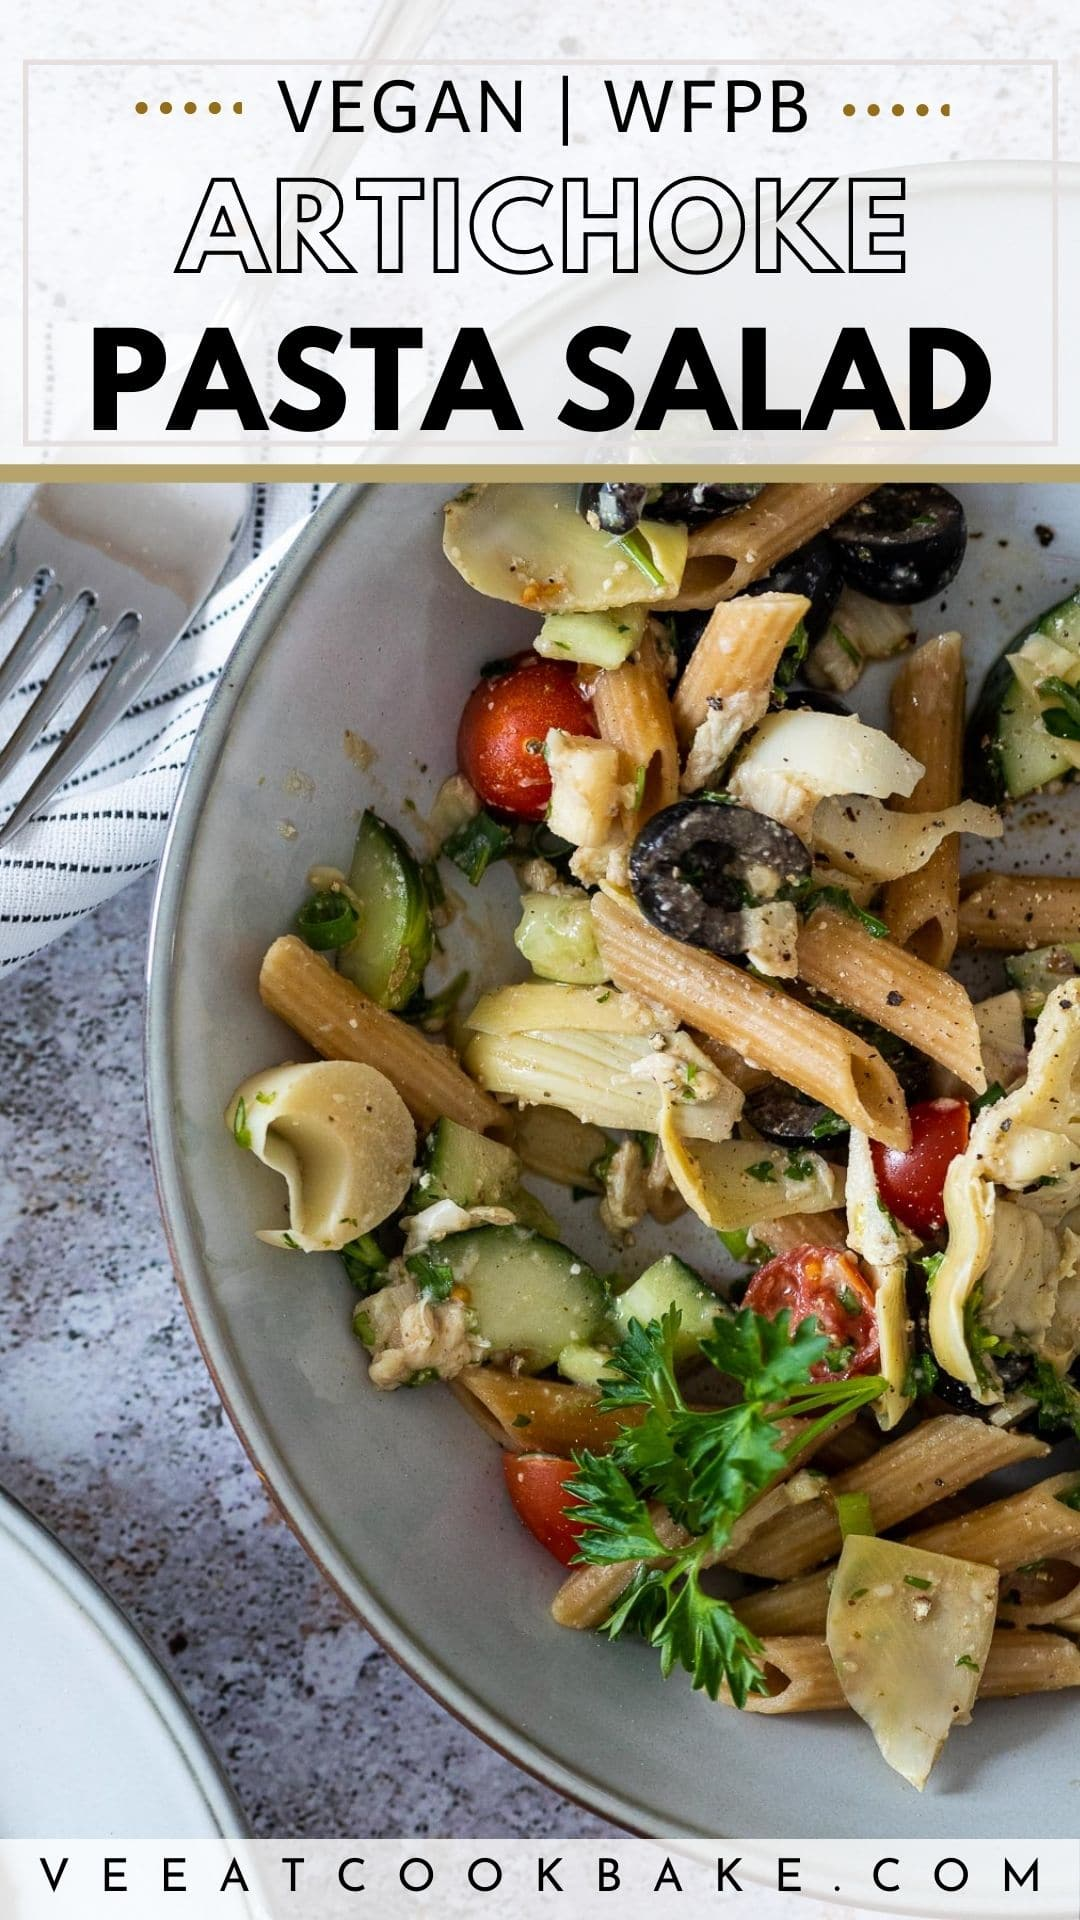 Vegan Artichoke Pasta Salad Pin for Pinterest with Text